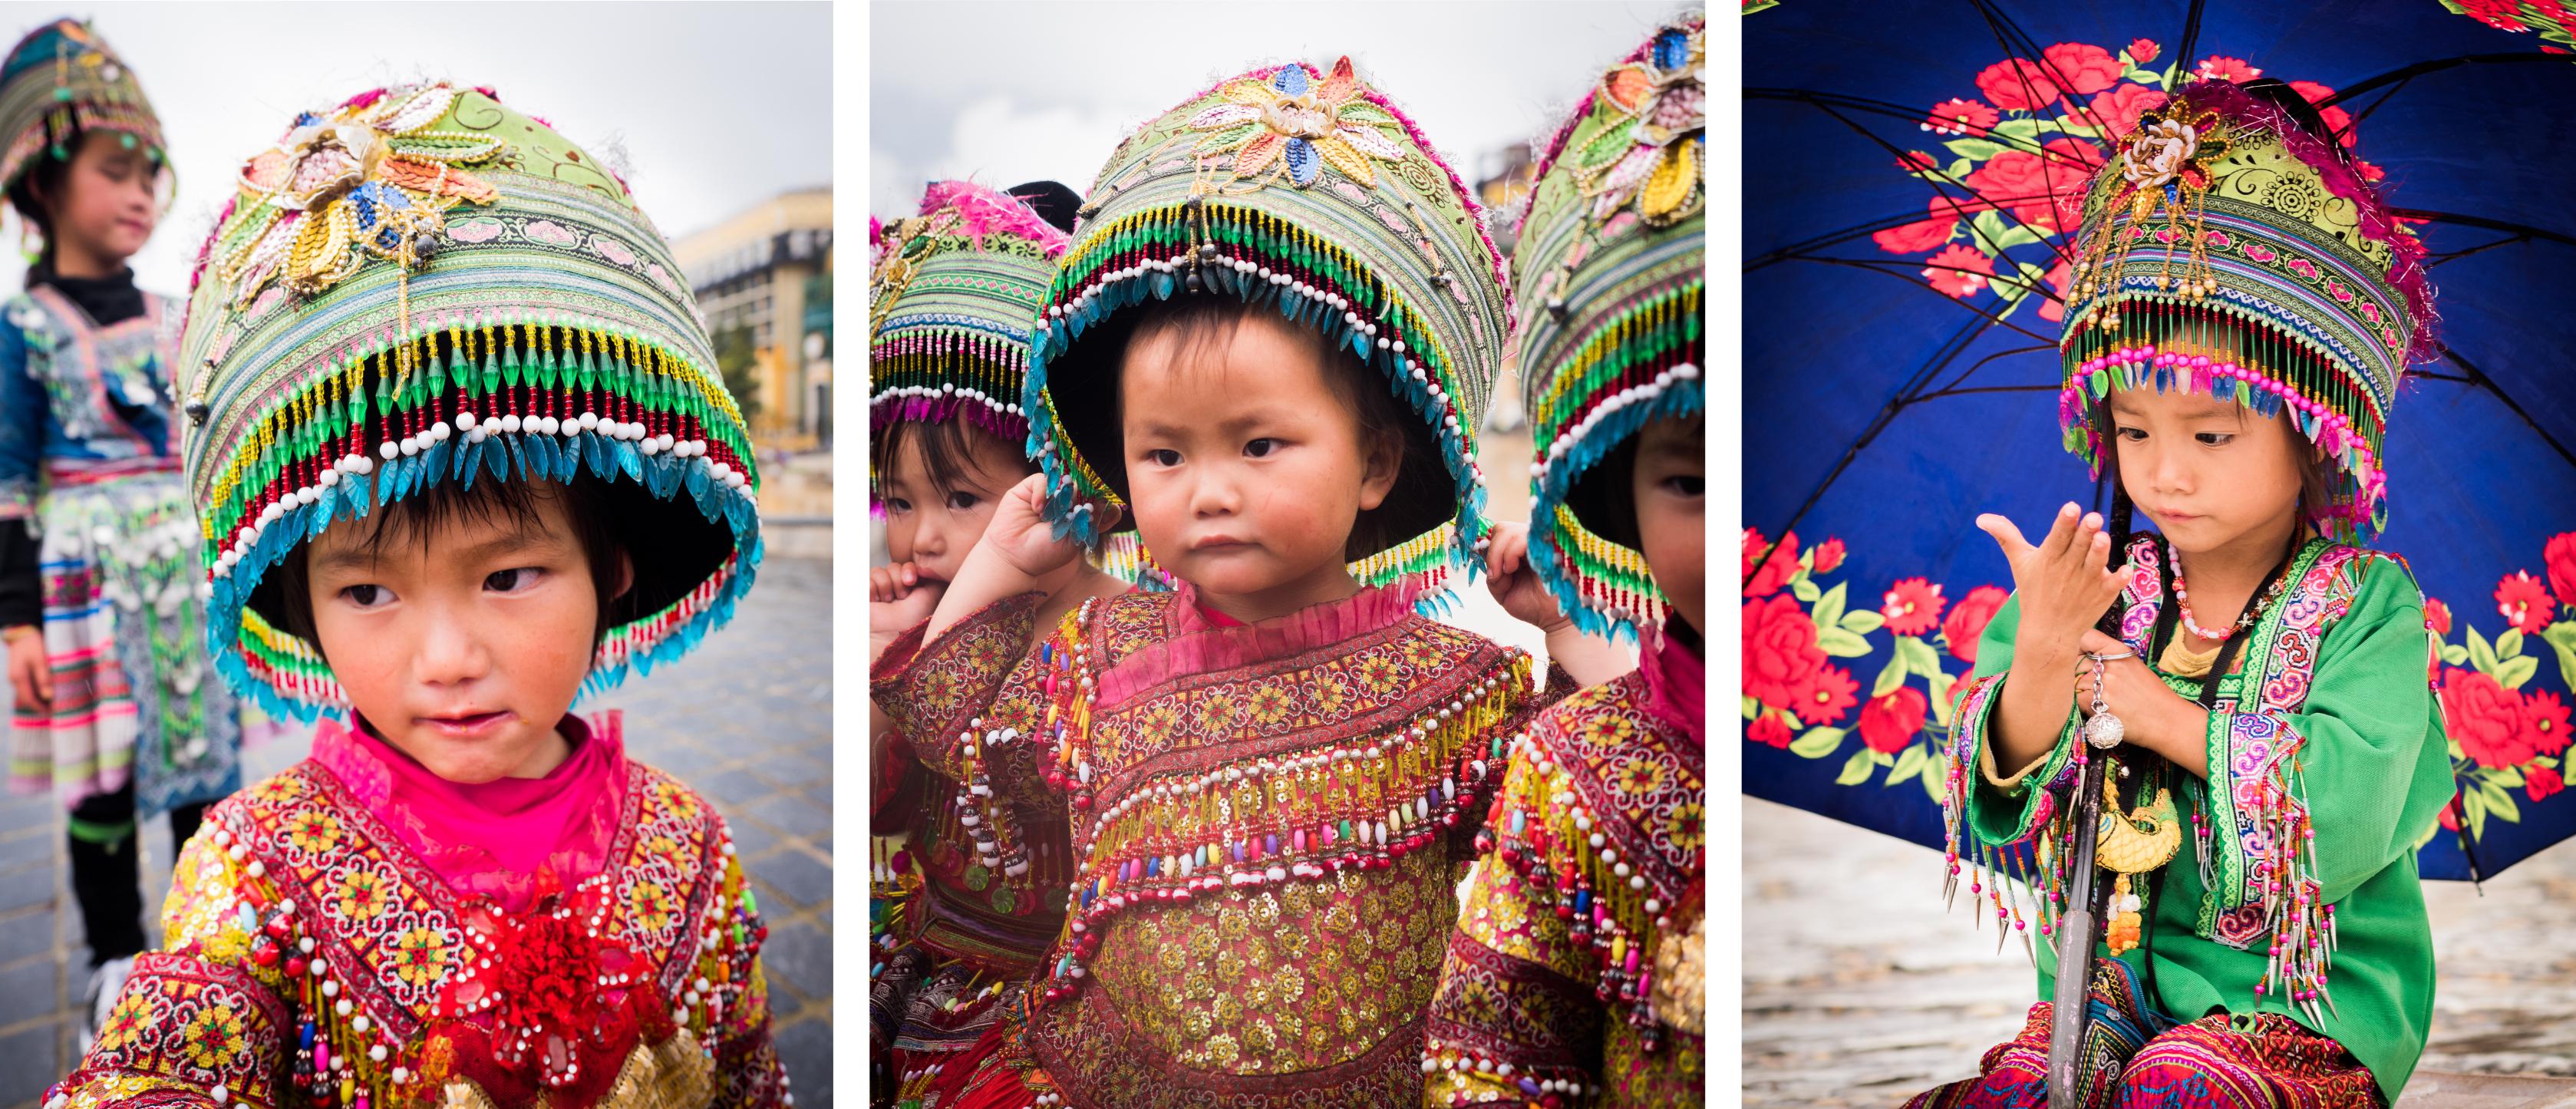 sapa, vietnam - ethnie minoritaire - sapa - portraits